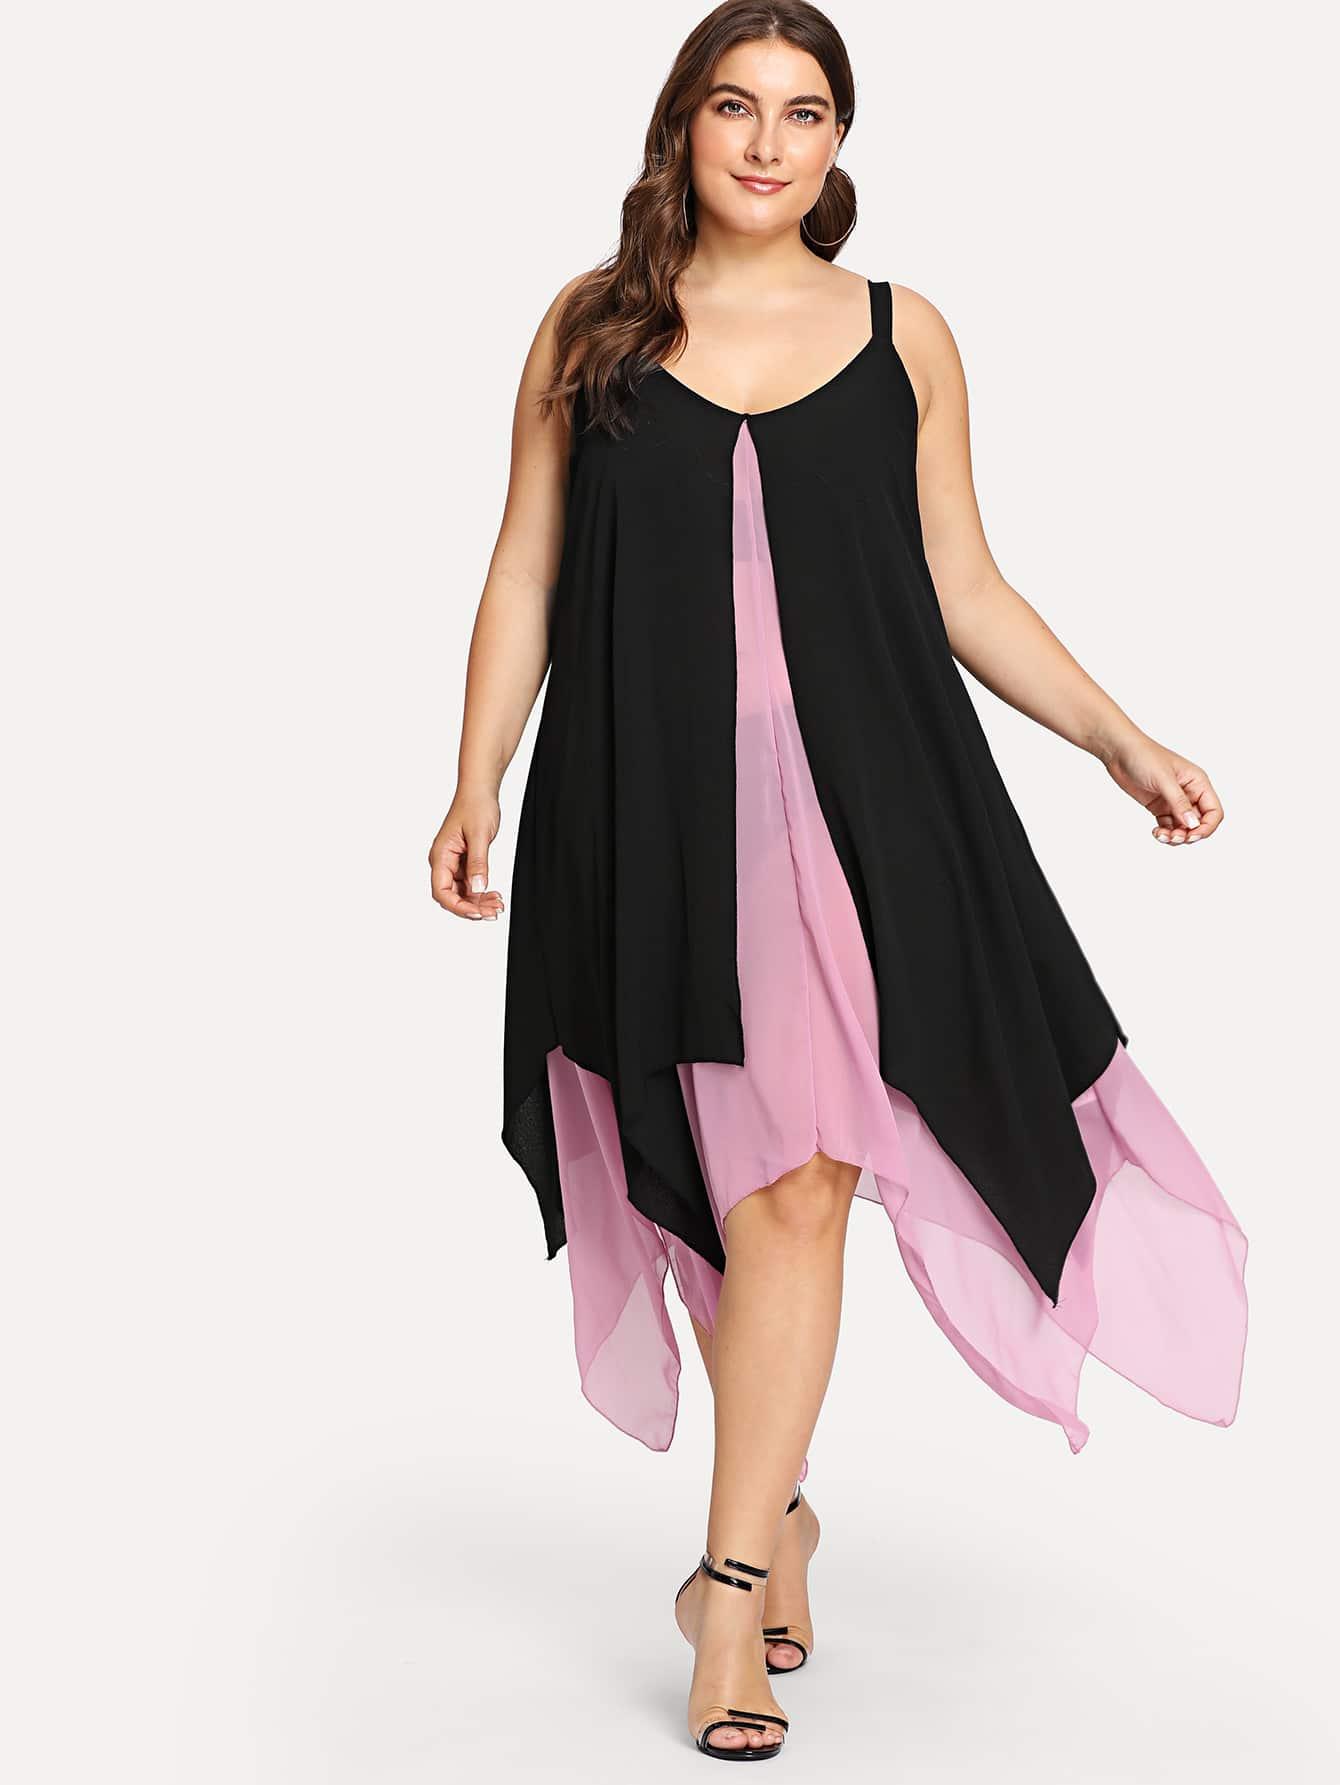 Two Tone Layered Hanky Hem Dress high slit hanky hem metallic halter dress